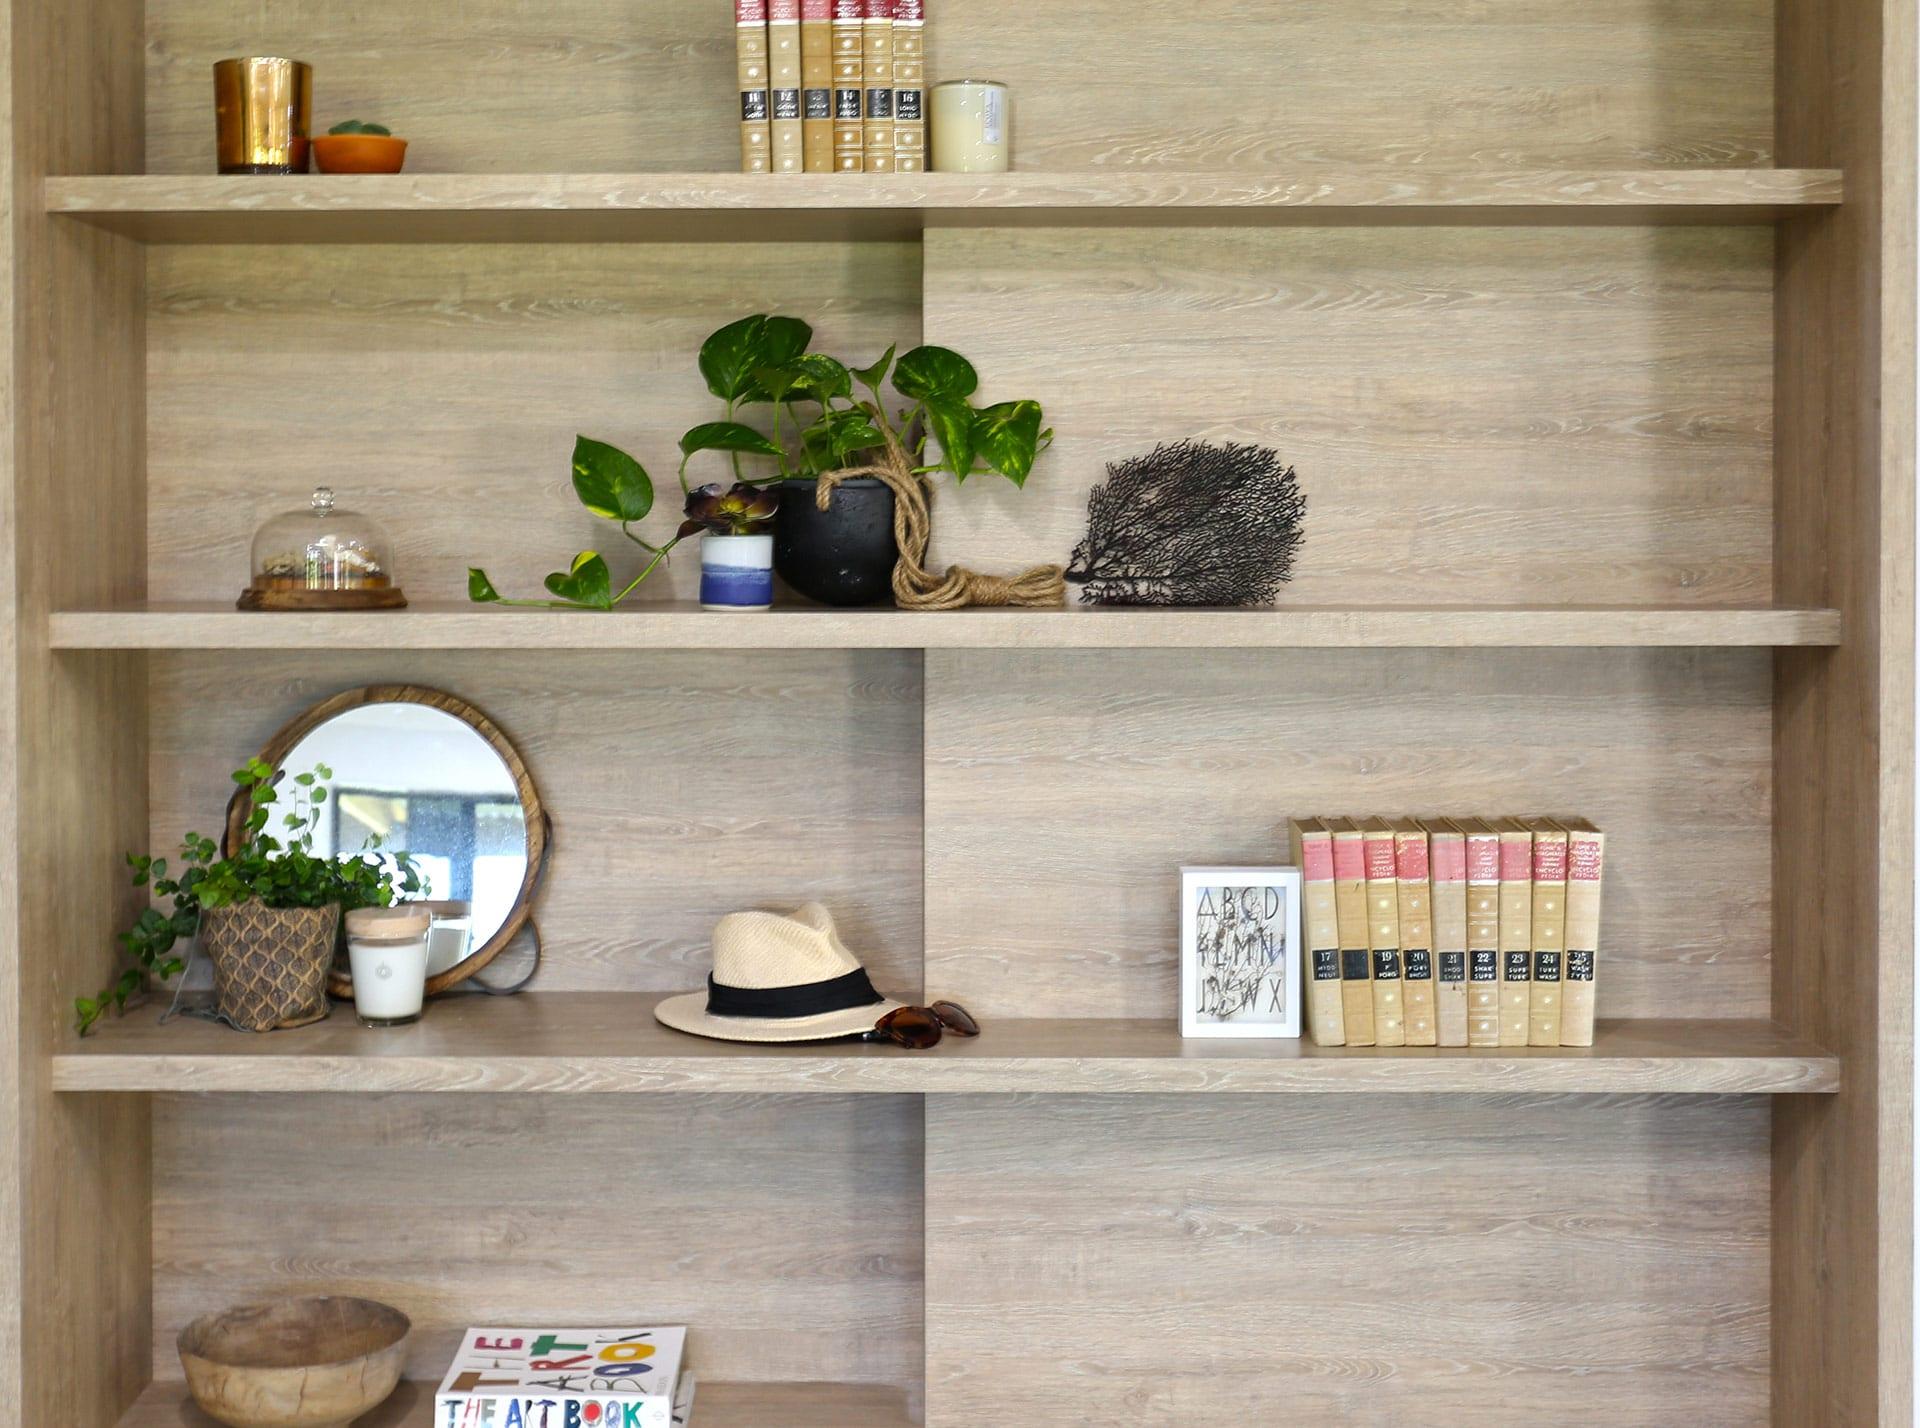 Orkabie book shelf